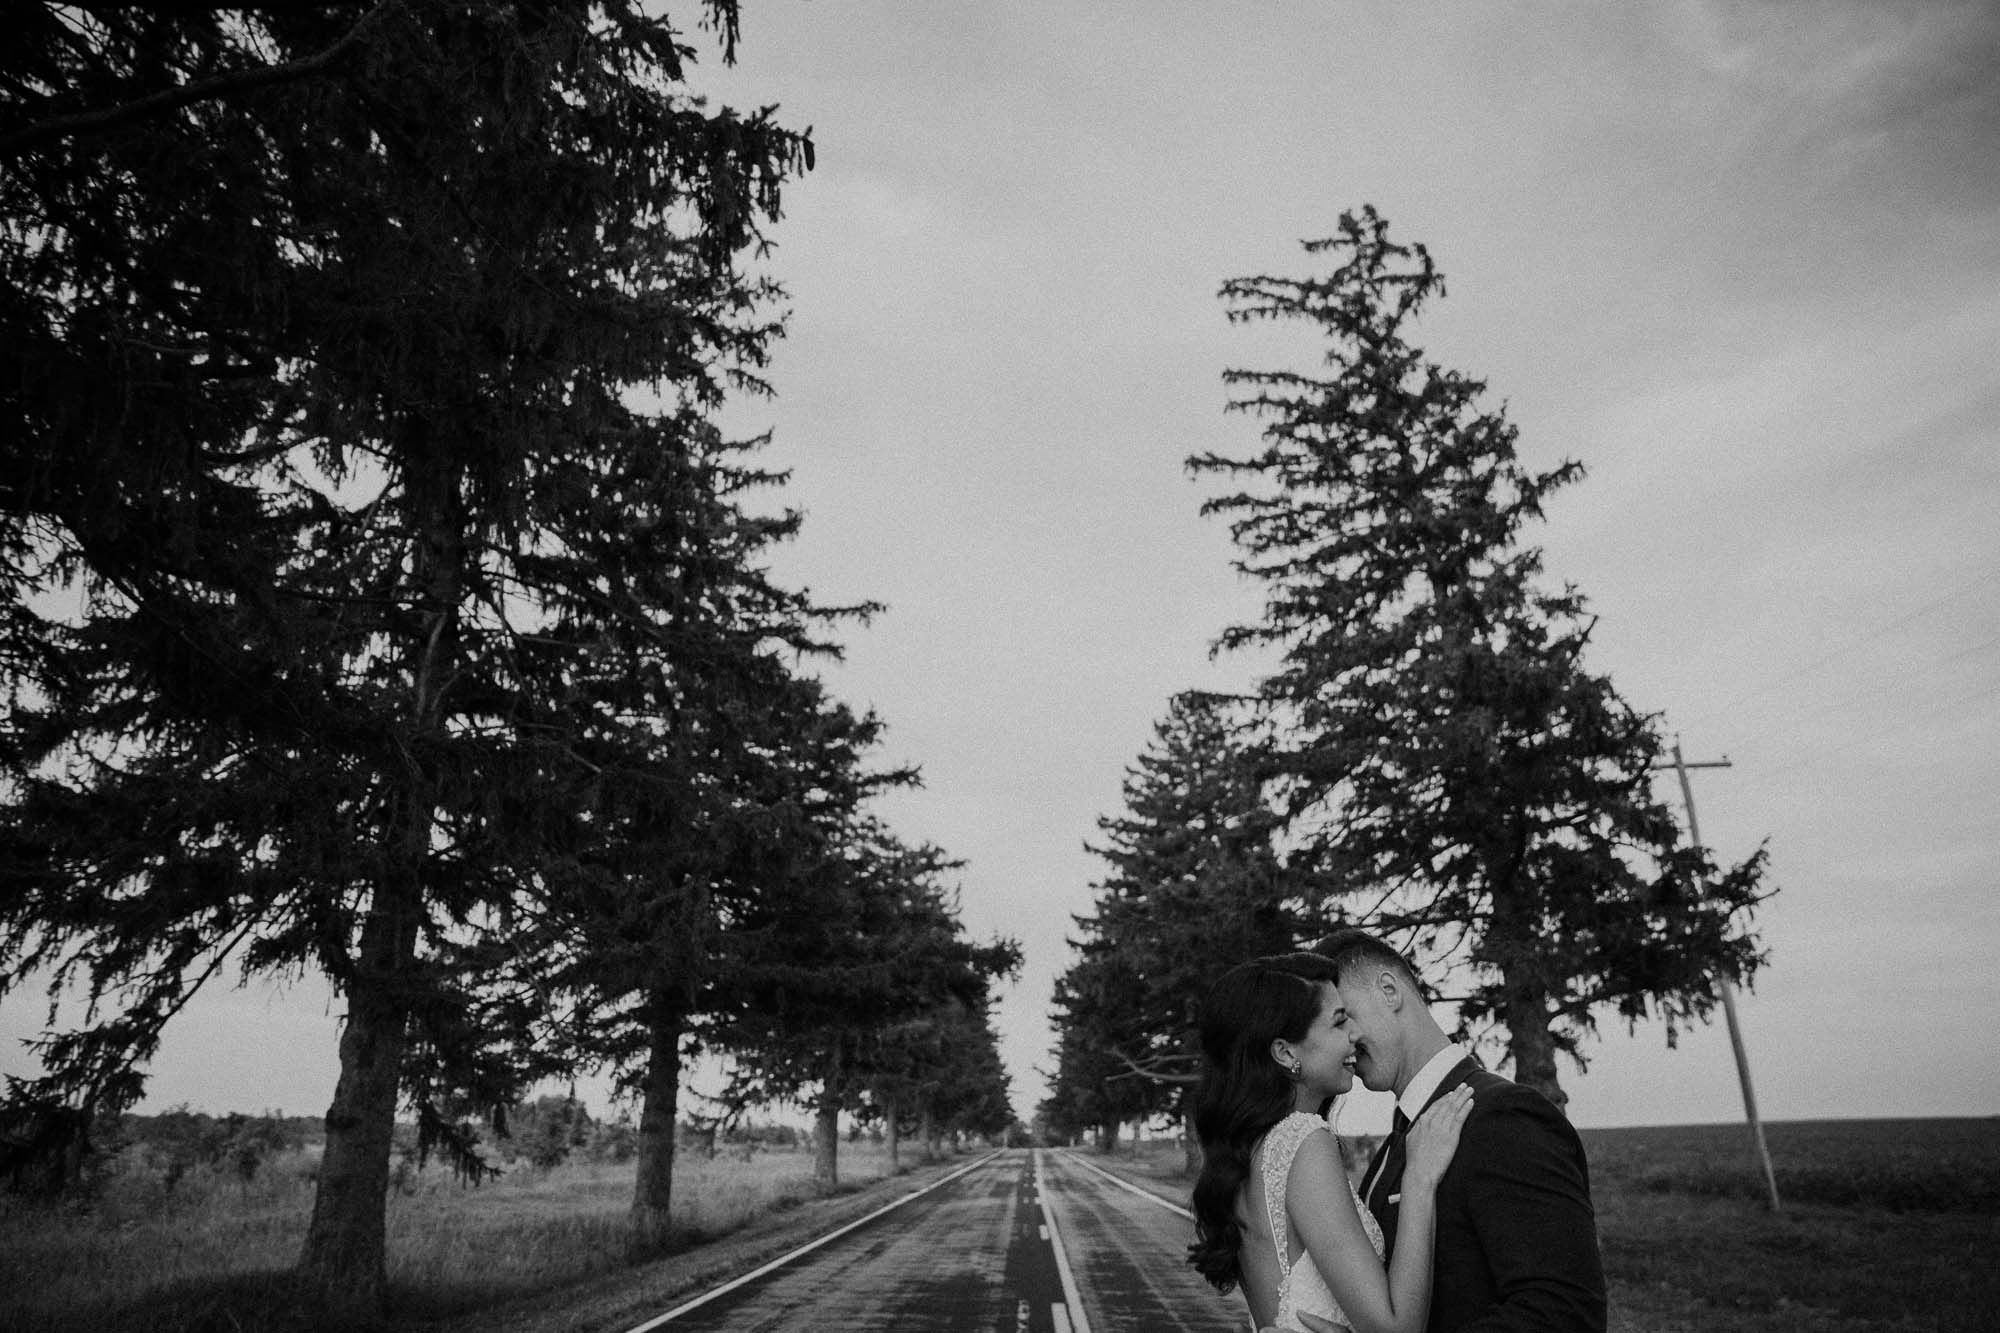 champaign_il_wedding_photography-0800.jpg